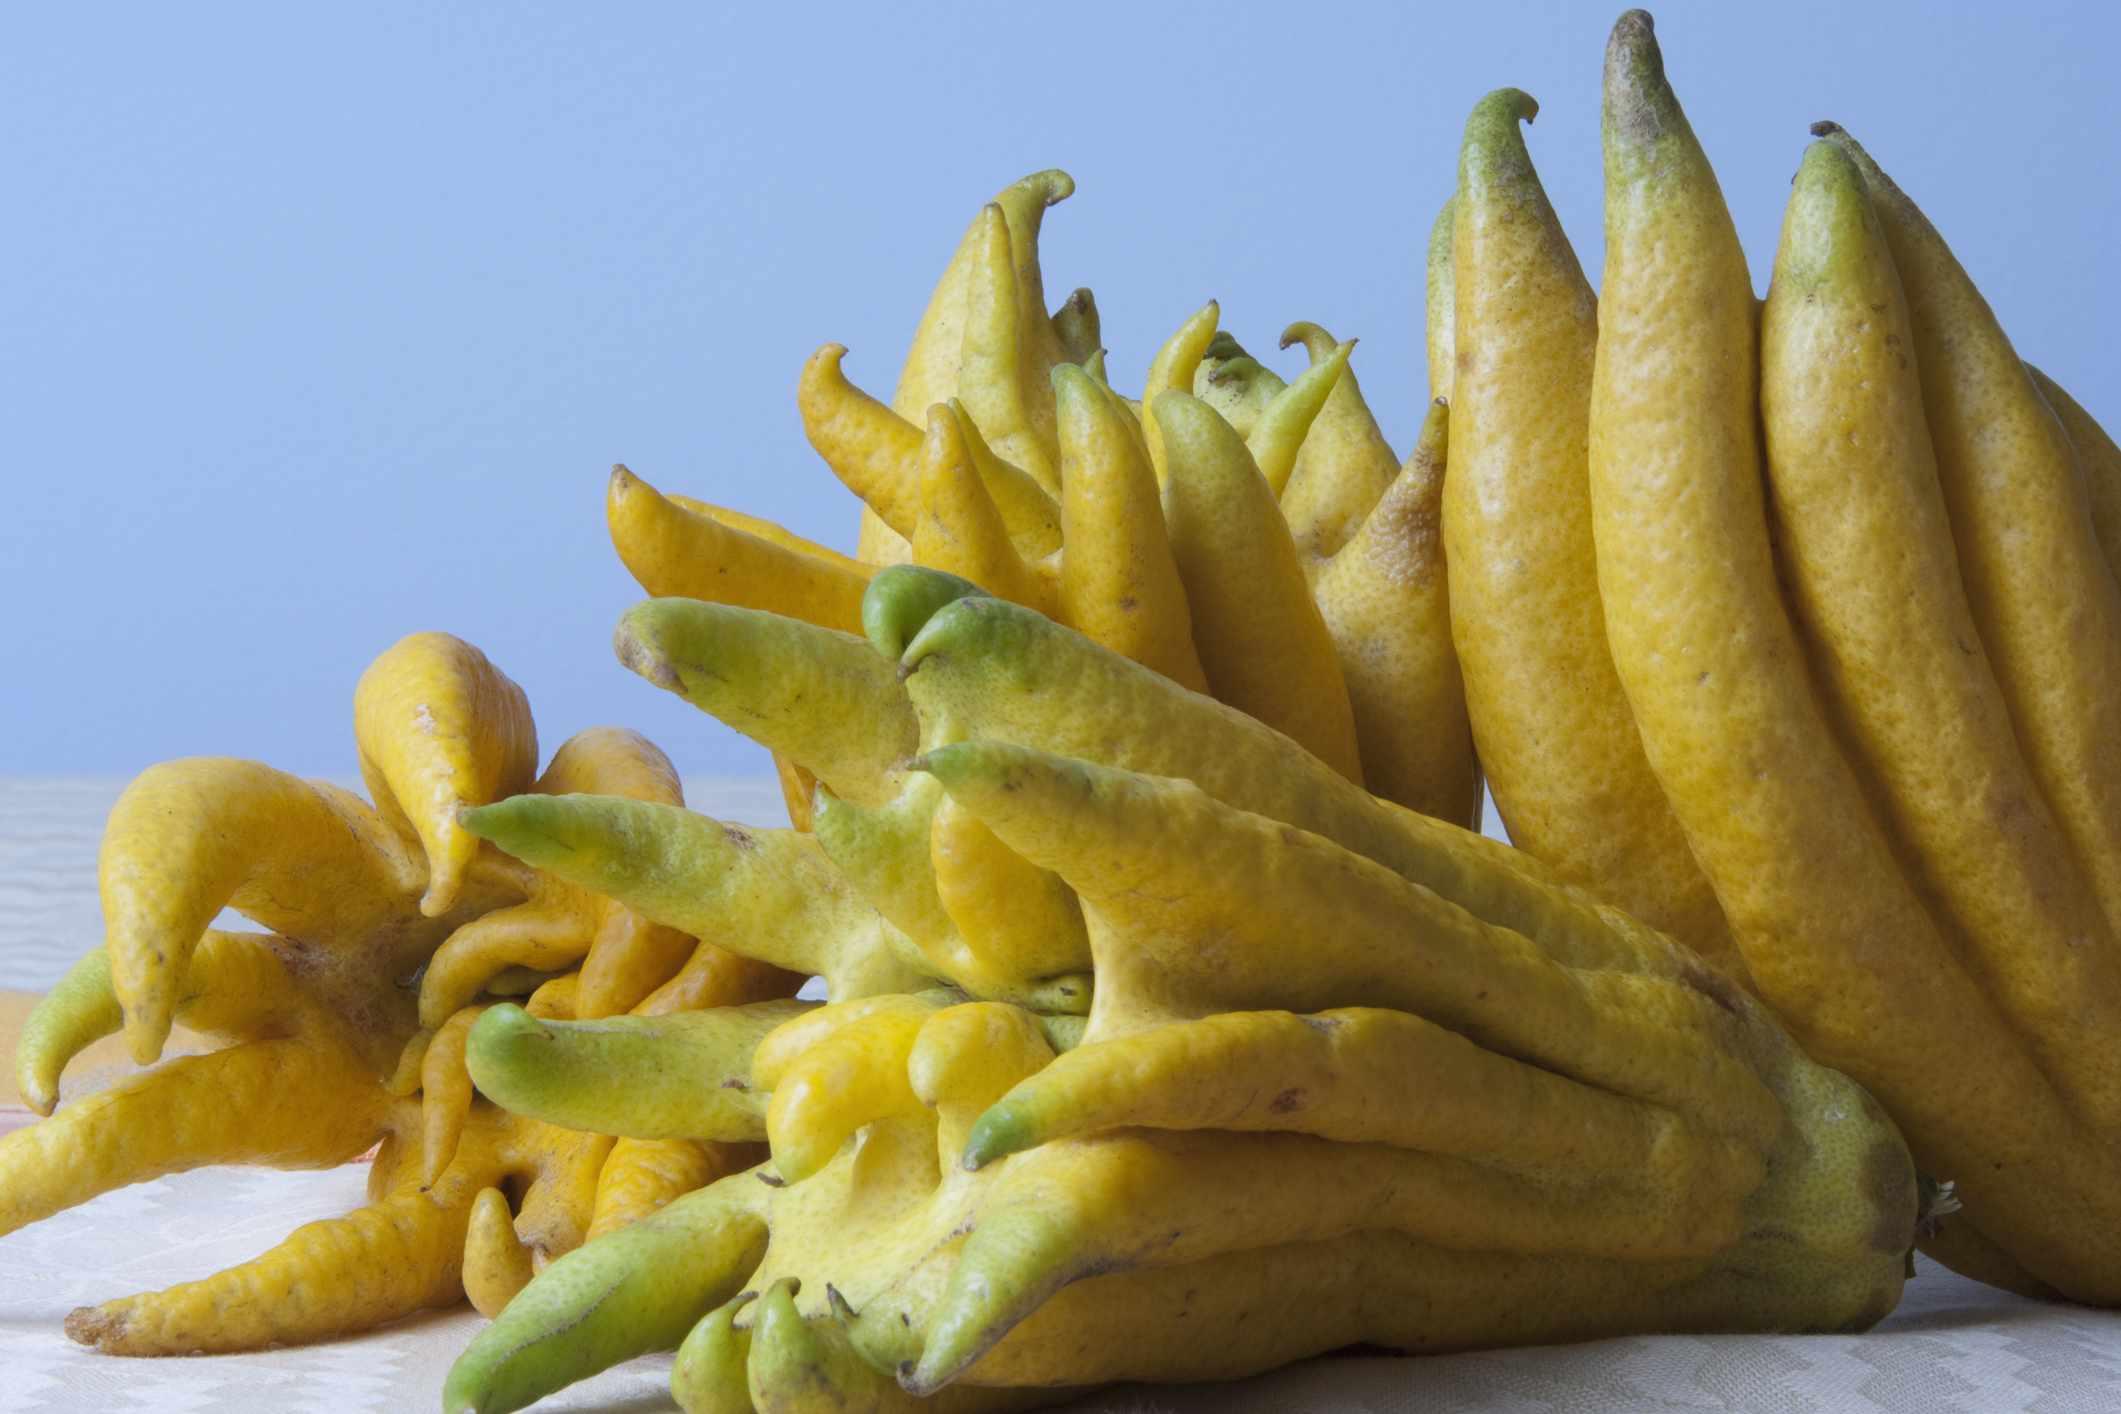 Fingered Citron